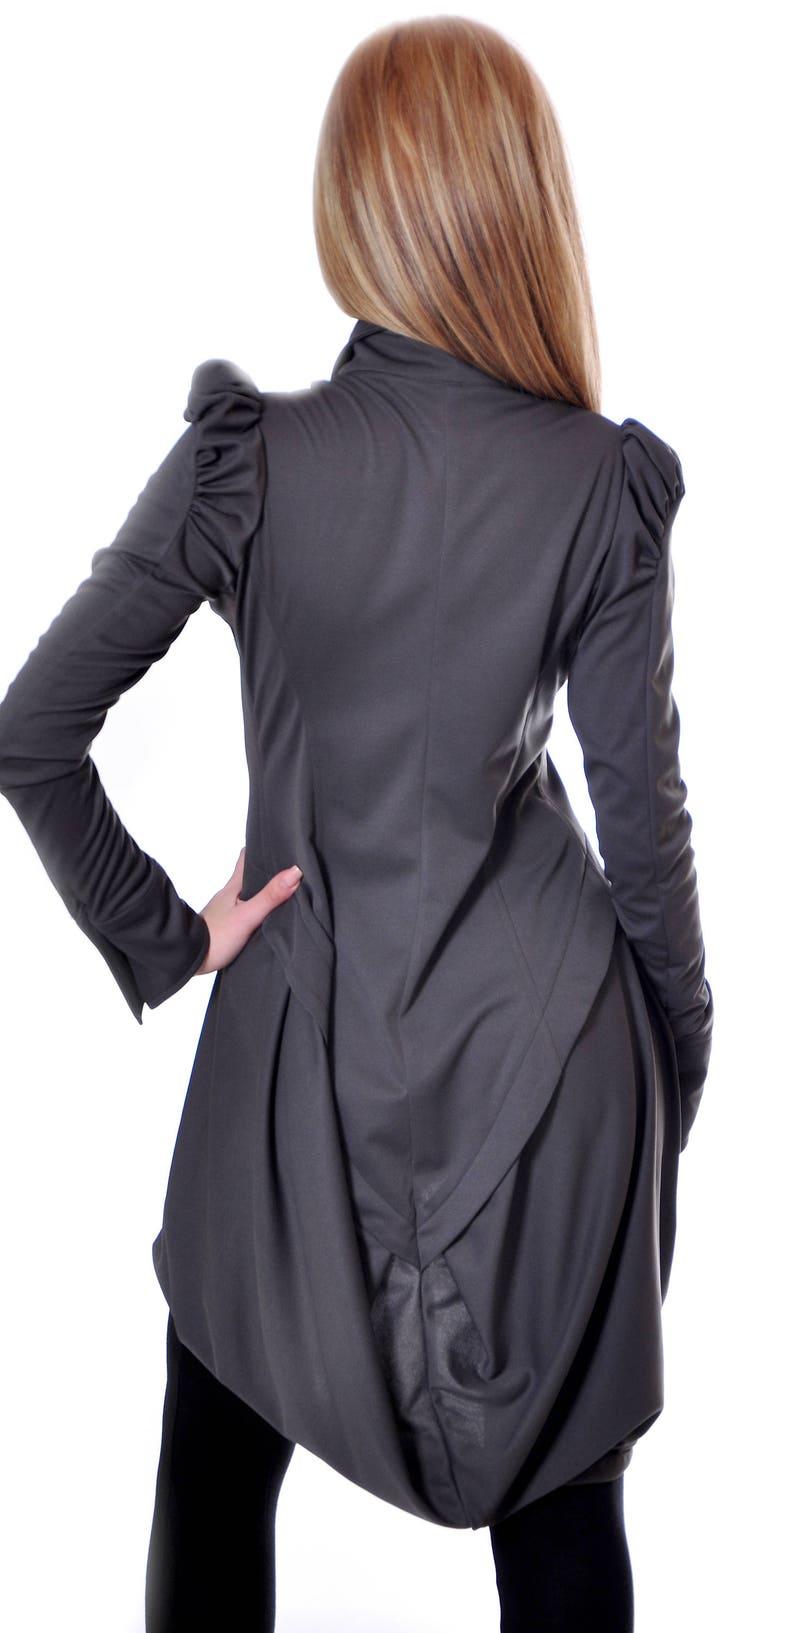 Danely D14.05.1 Party Top Design Blouse Extravagant Tunic Top Elegant Tunic Womens Shirt Asymmetrical Shirt Tunic Purple Cotton Shirt